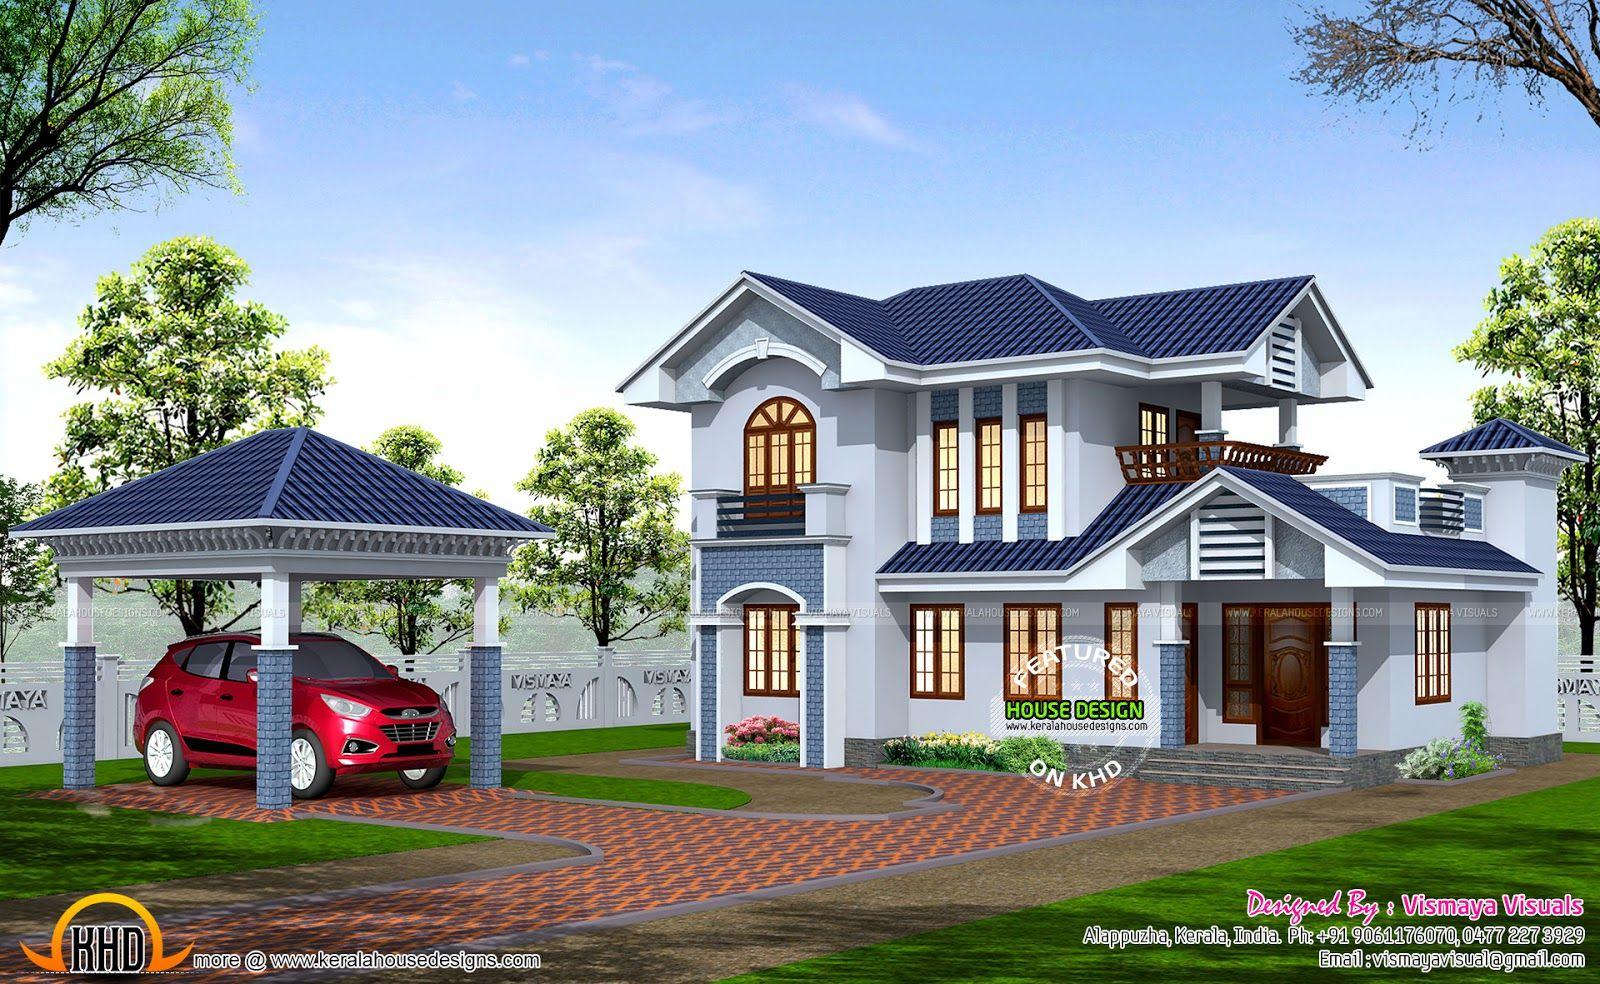 Home design types 2380 sq ft box type house kerala home design and - Pin By Homeinner Home Design House Plans Interior Design On Homeinner Home Design House Plans Interior Design Pinterest Kerala And Villas